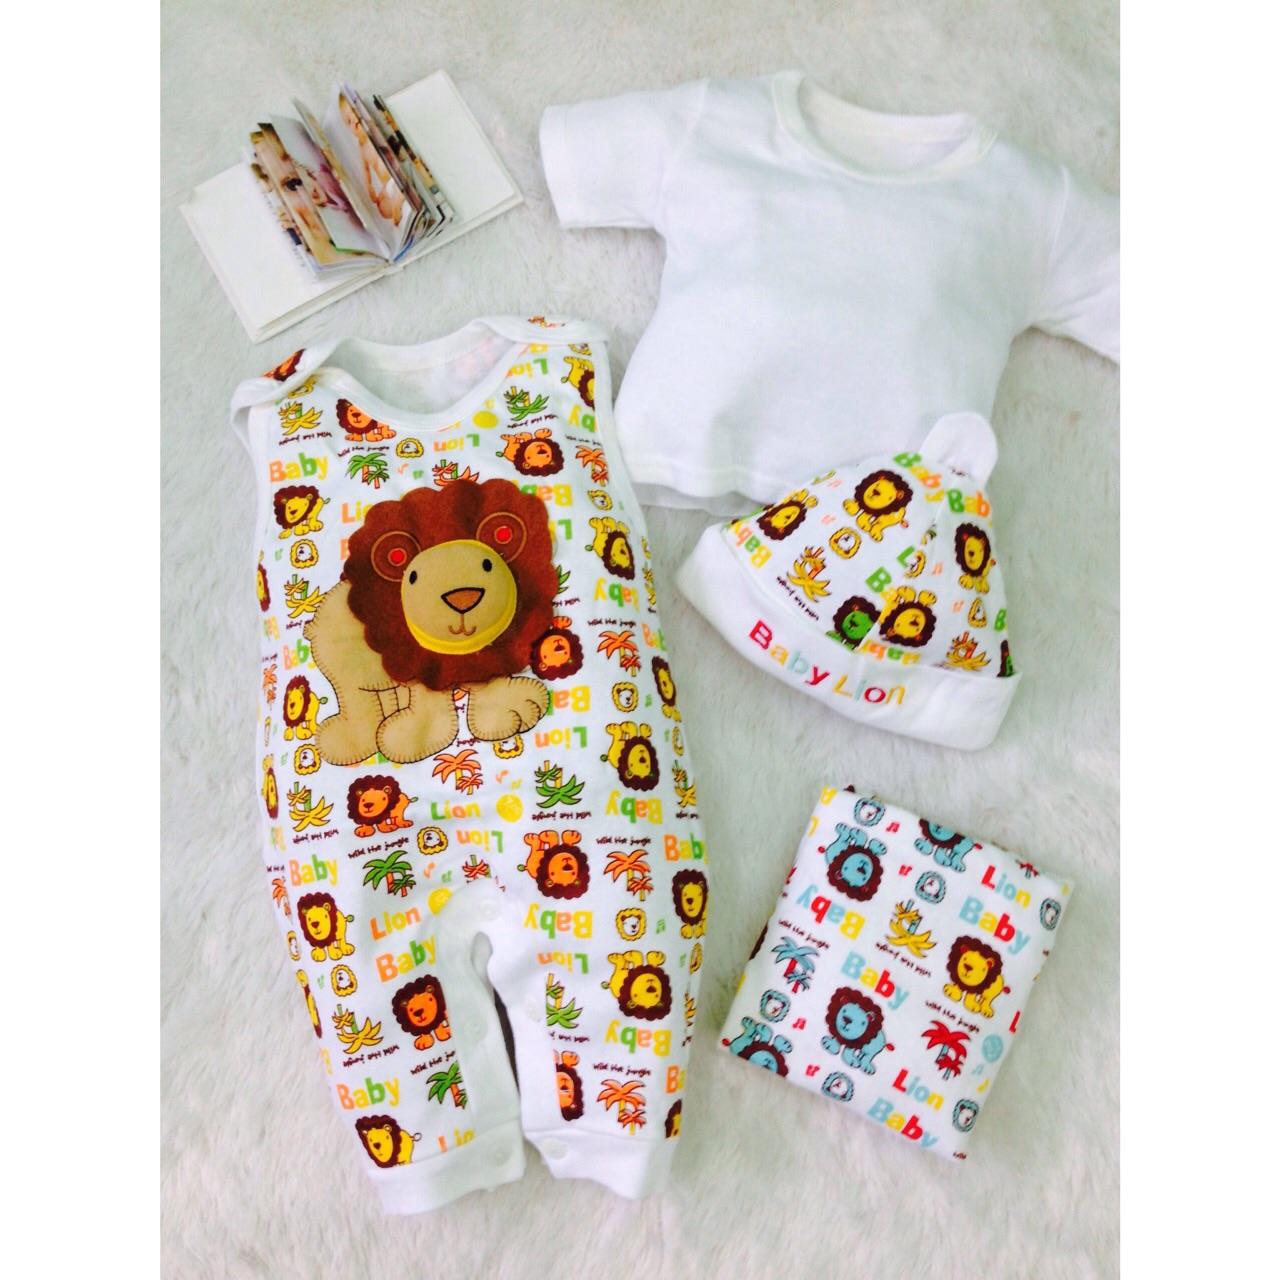 Baju Bayi Lucu Murah Di Madiun Jawa Baju Bayi Lucu Murah Di